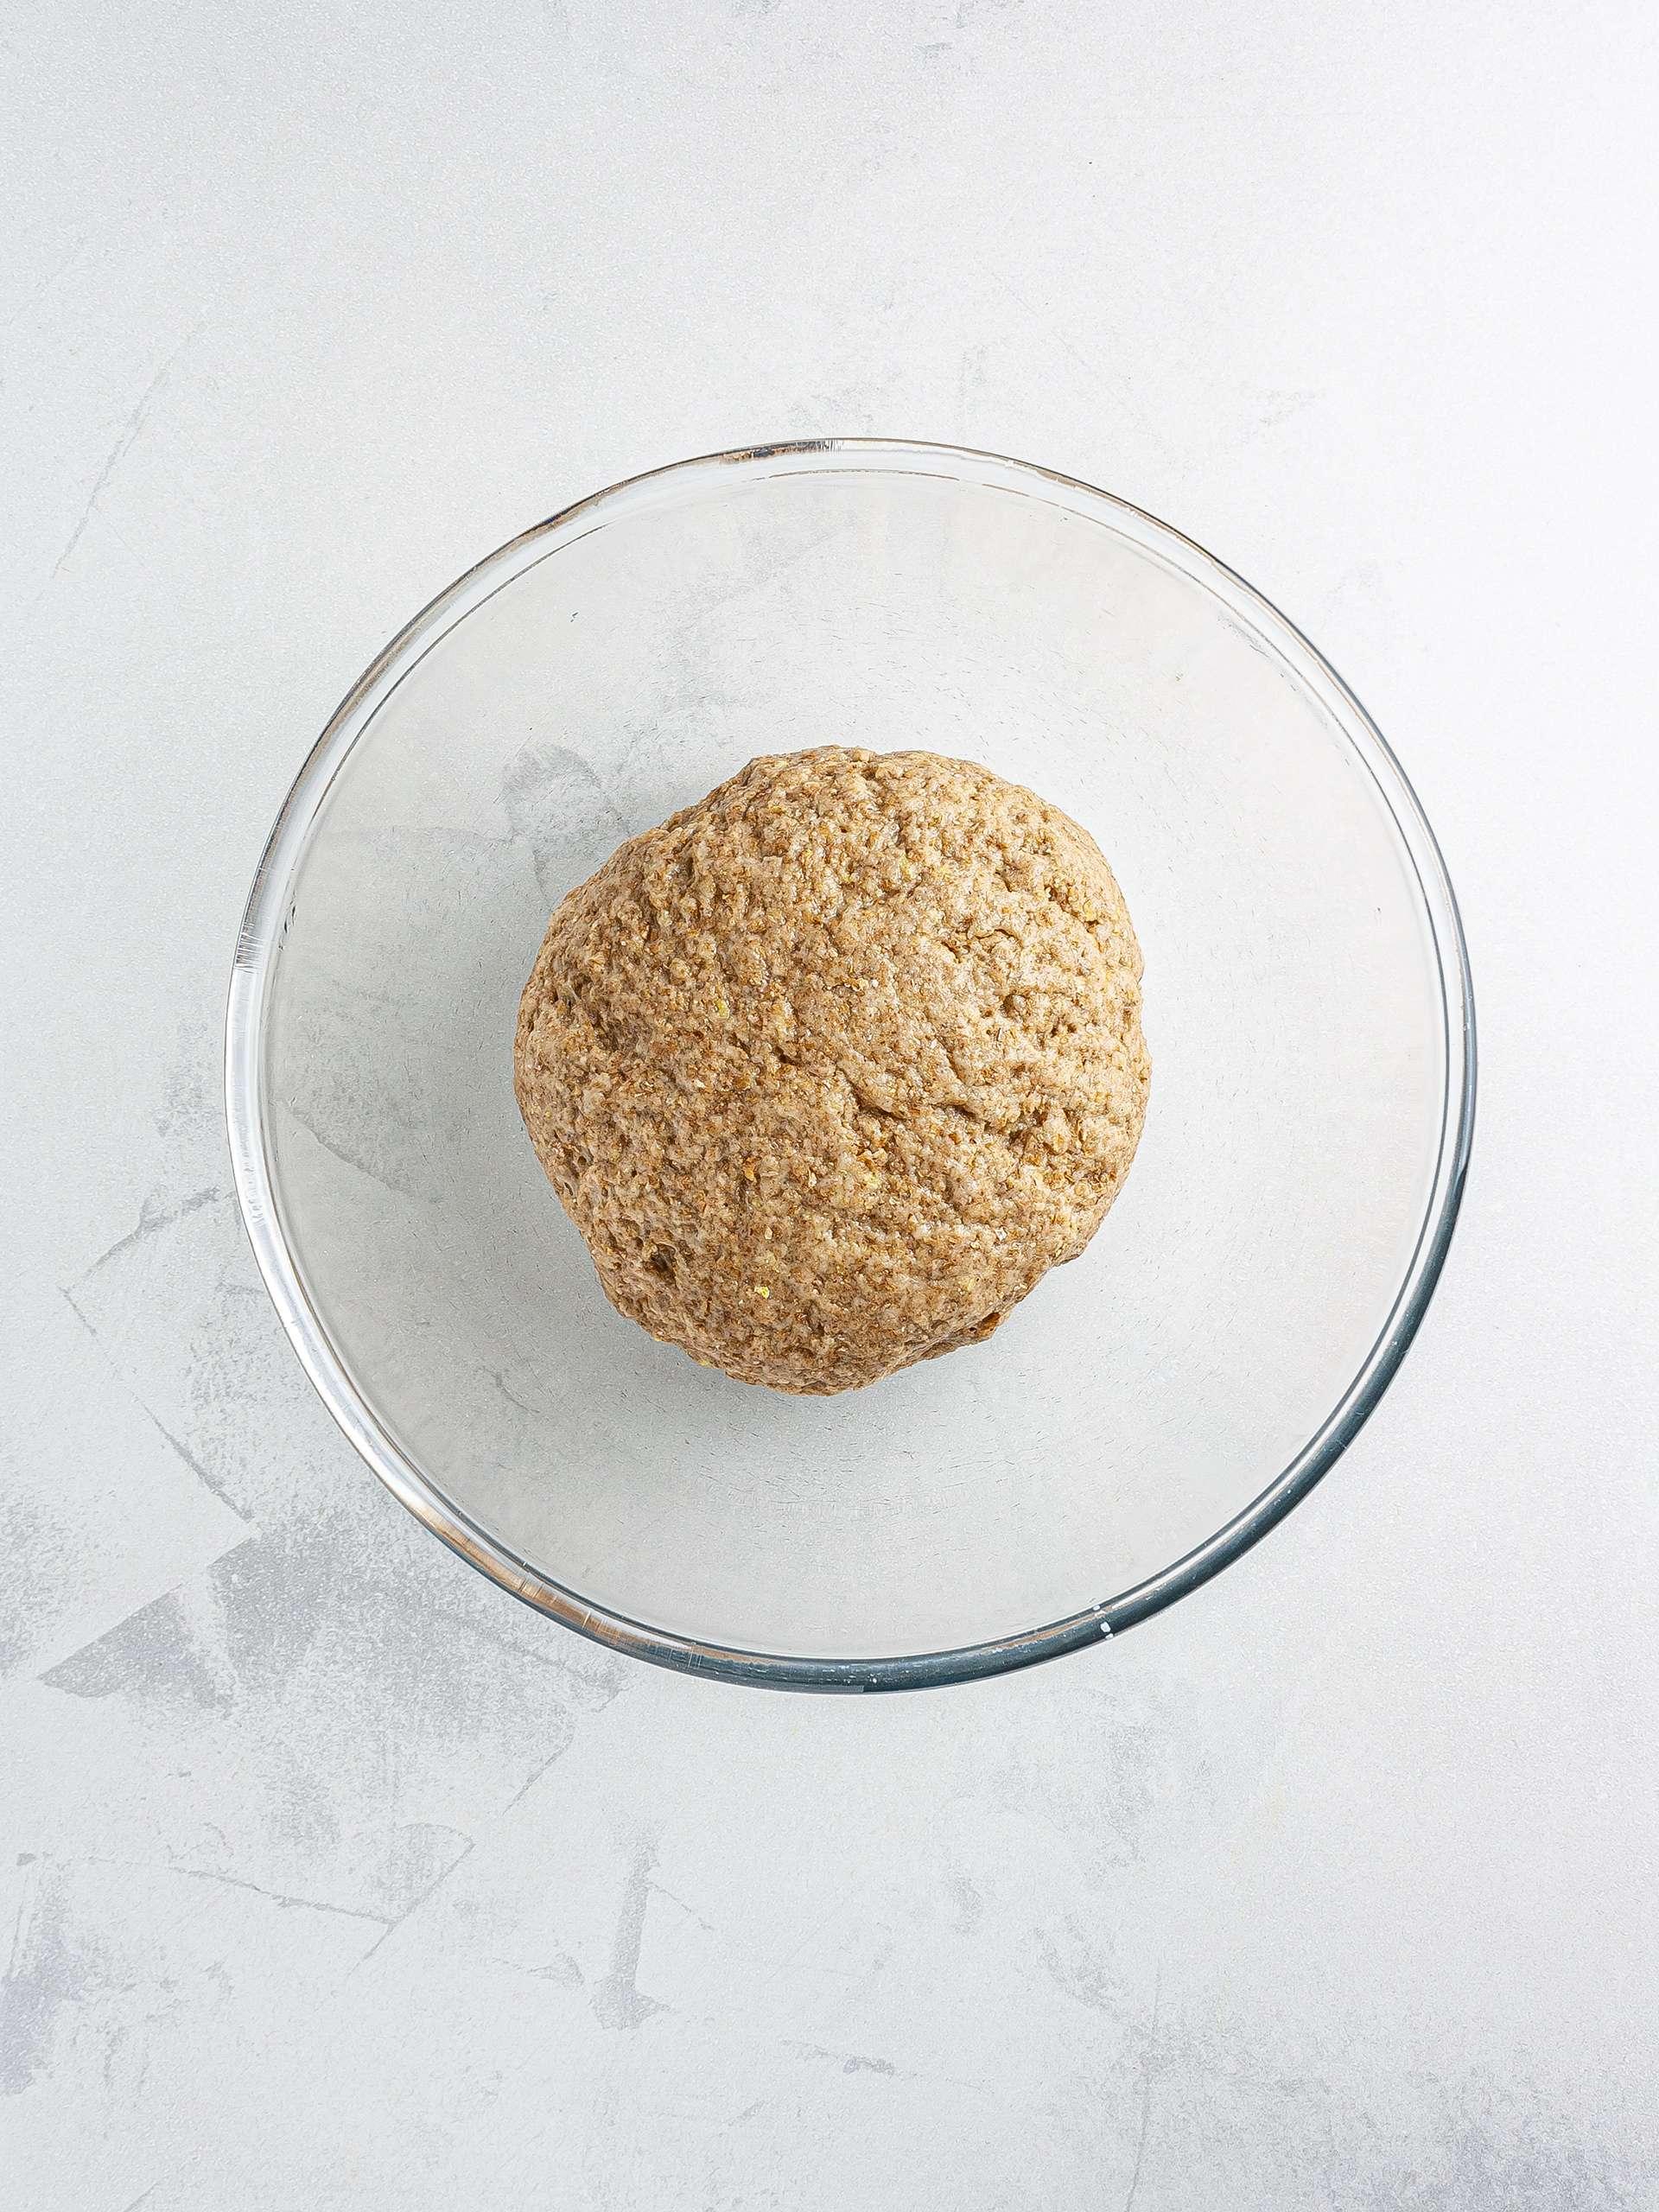 Chin chin dough in a bowl